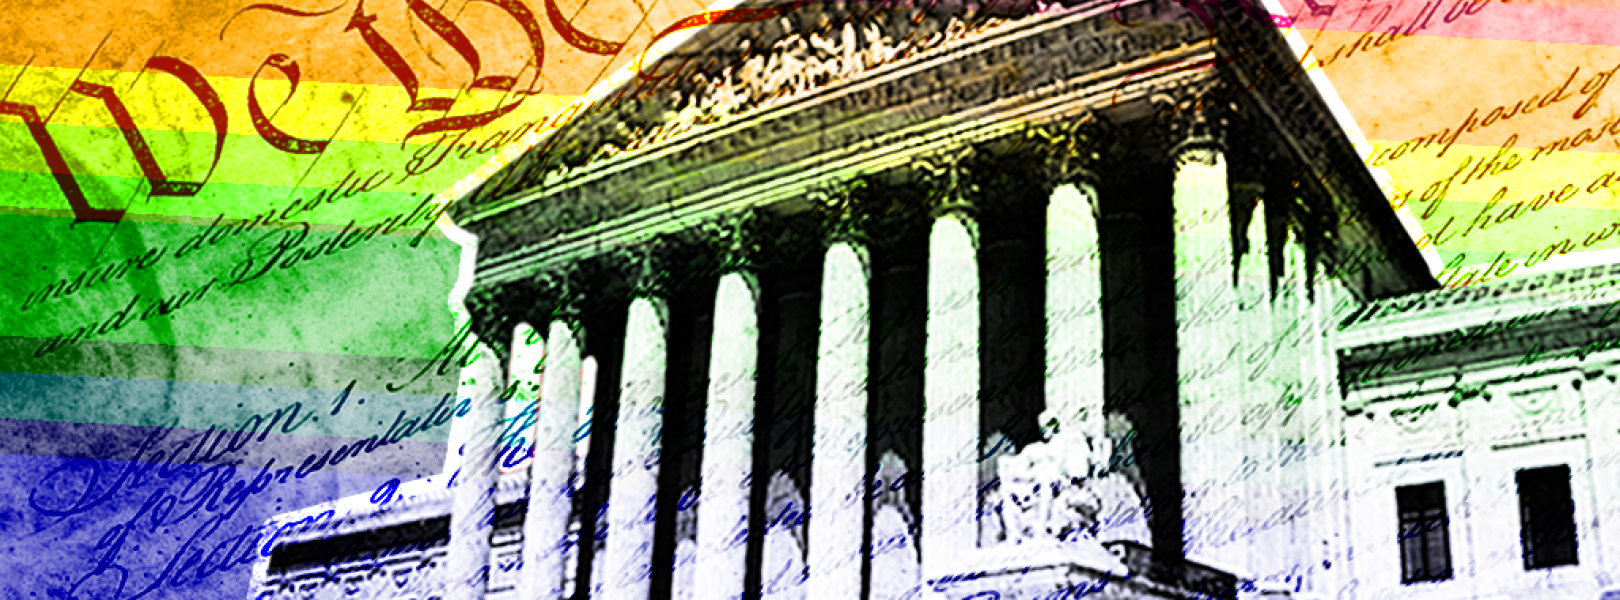 Supreme Court with rainbow